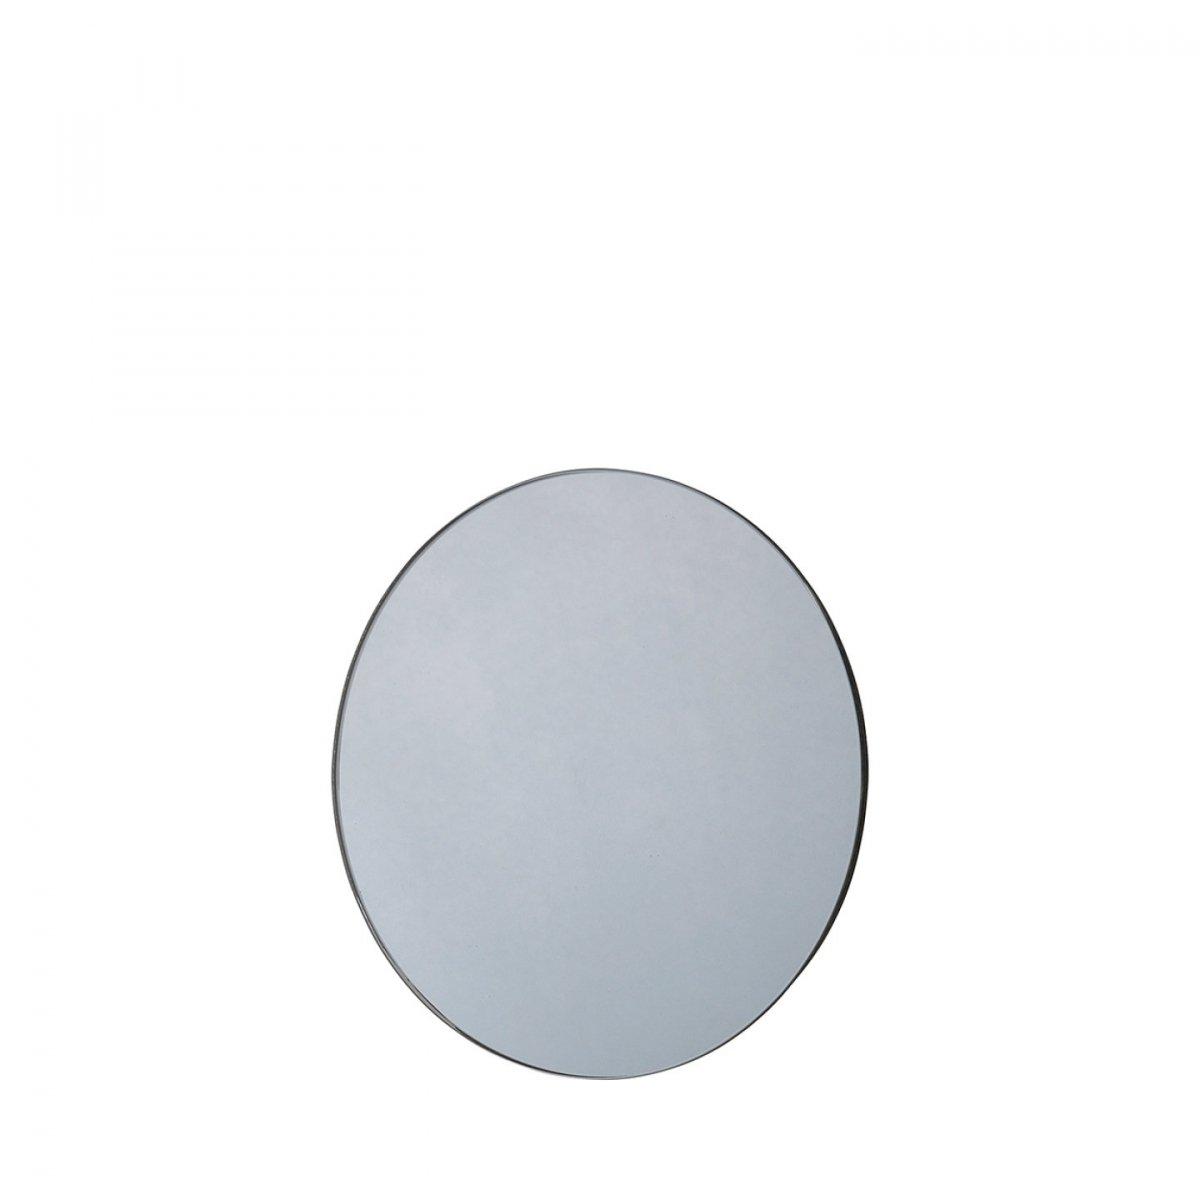 1090886e594a Blomus VISION Lustro Okrągłe 20 cm Szare